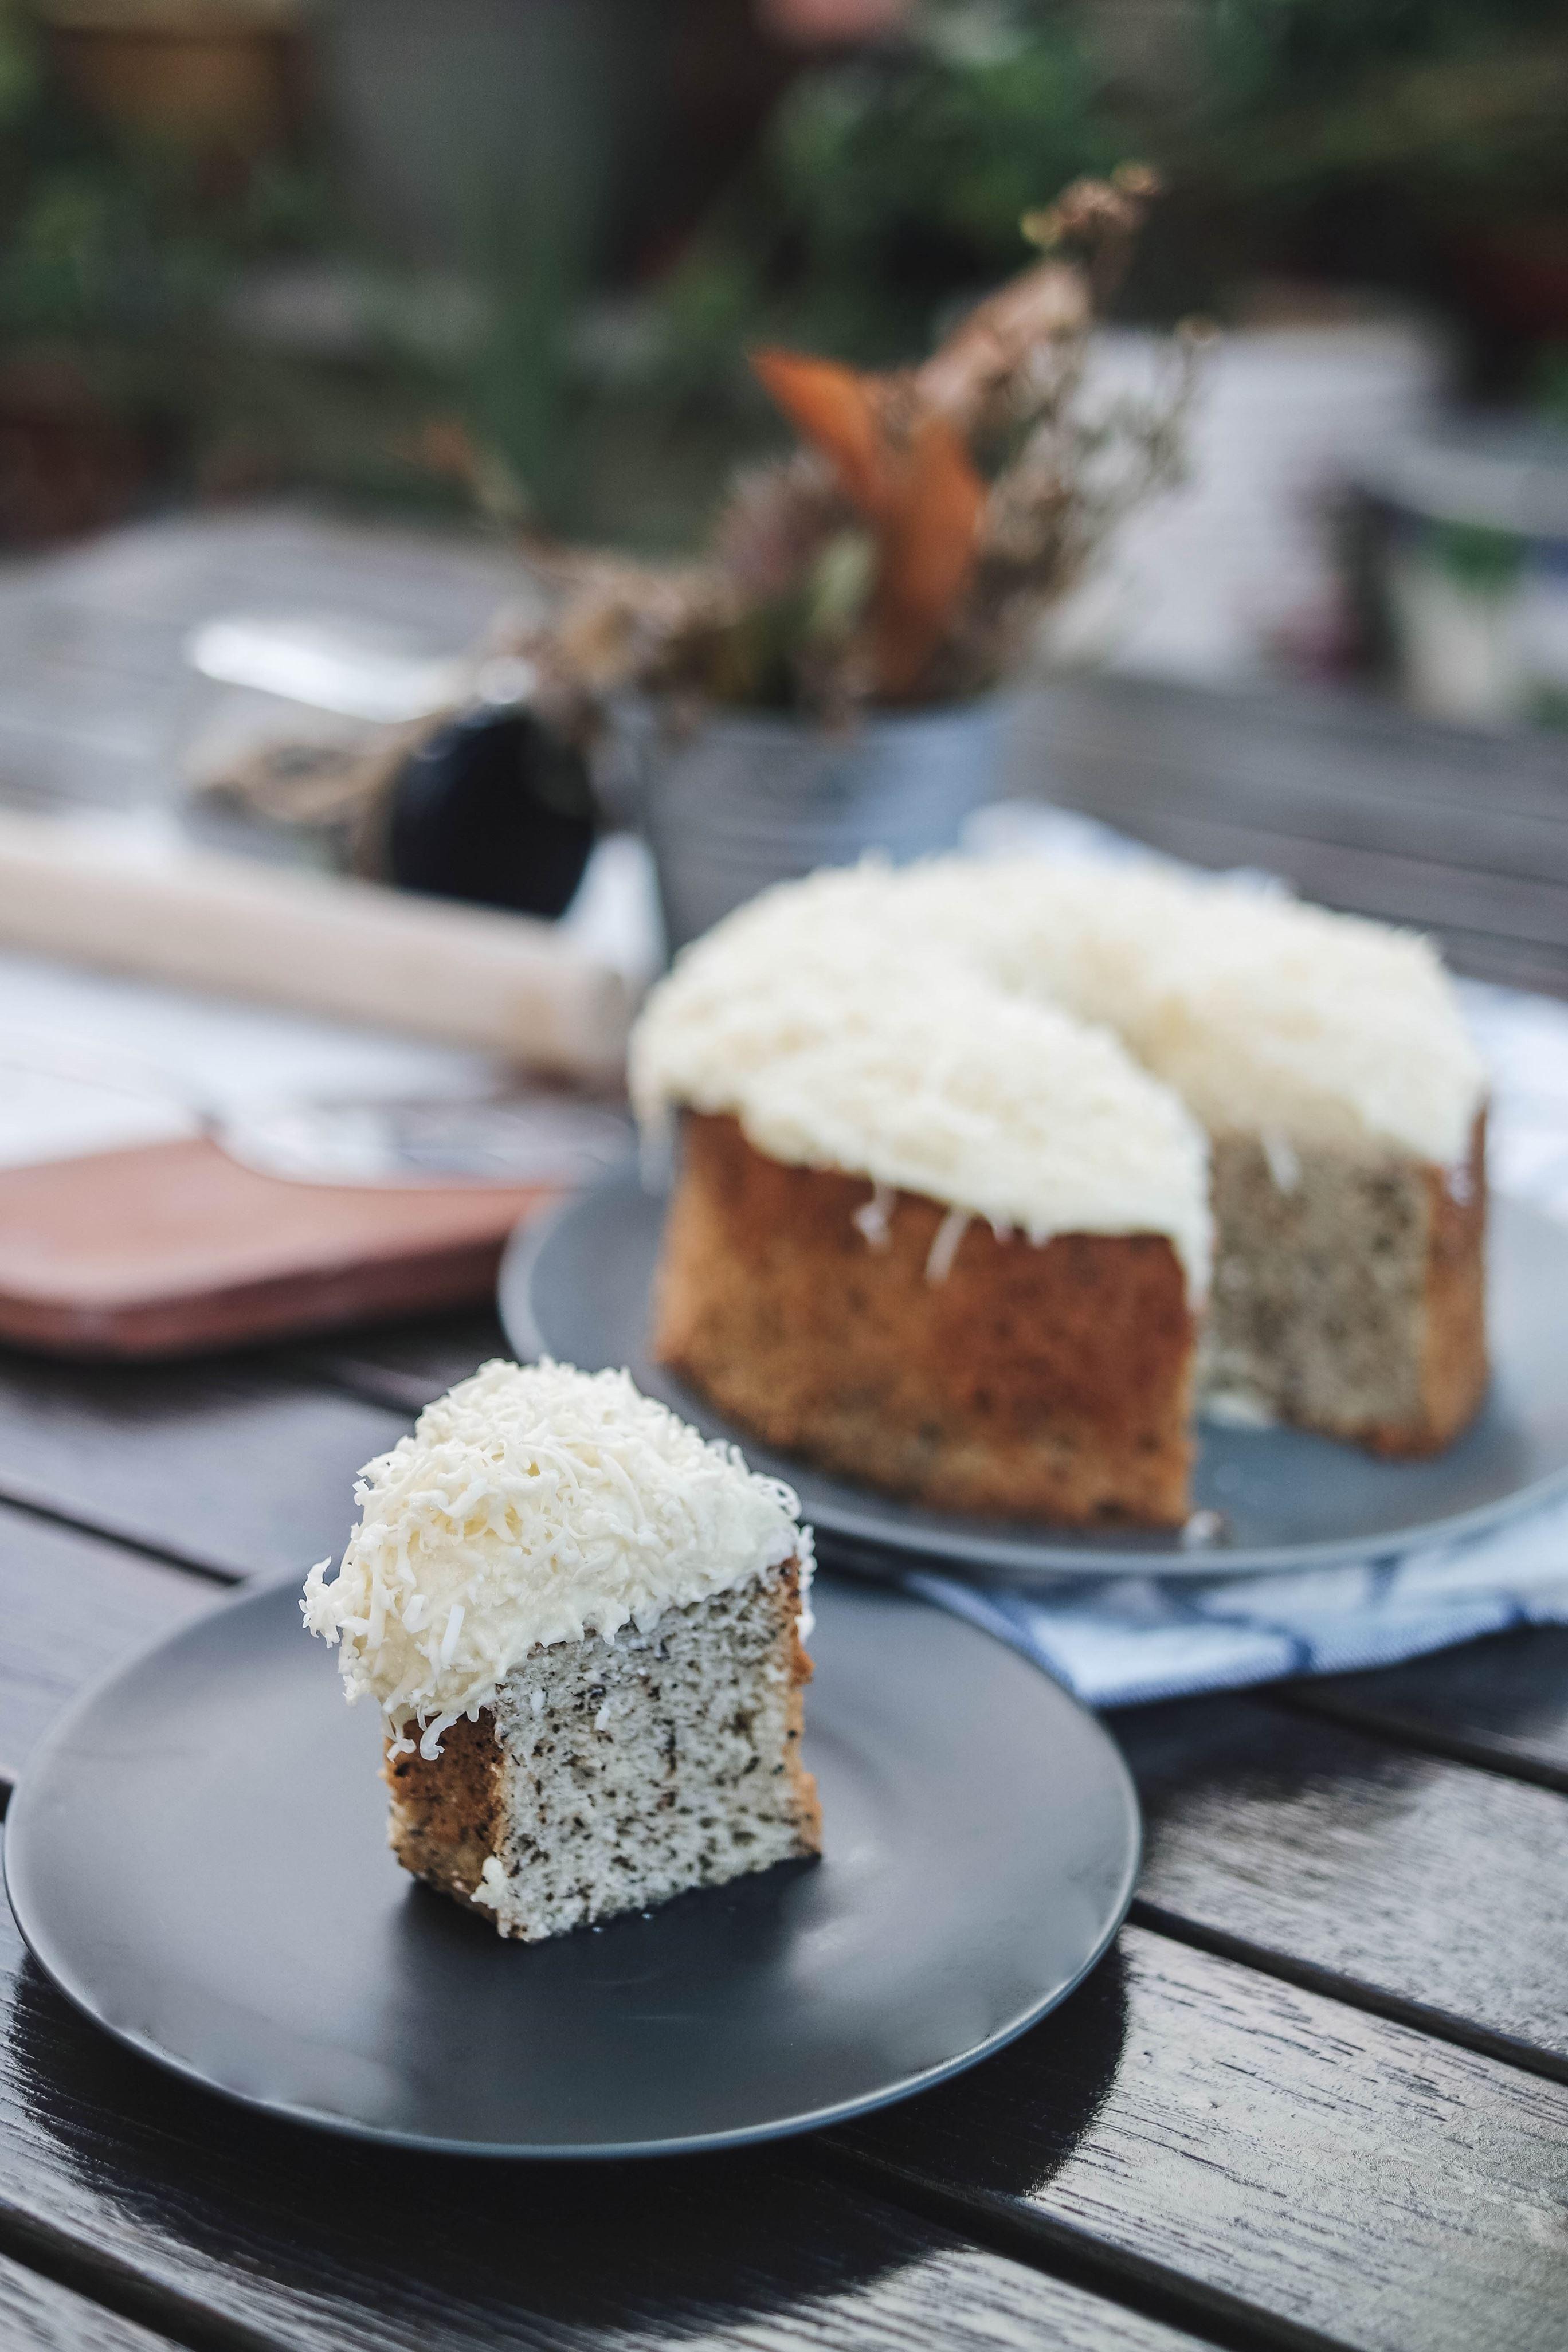 Jasmine Green Tea Chiffon Cake with Cheese